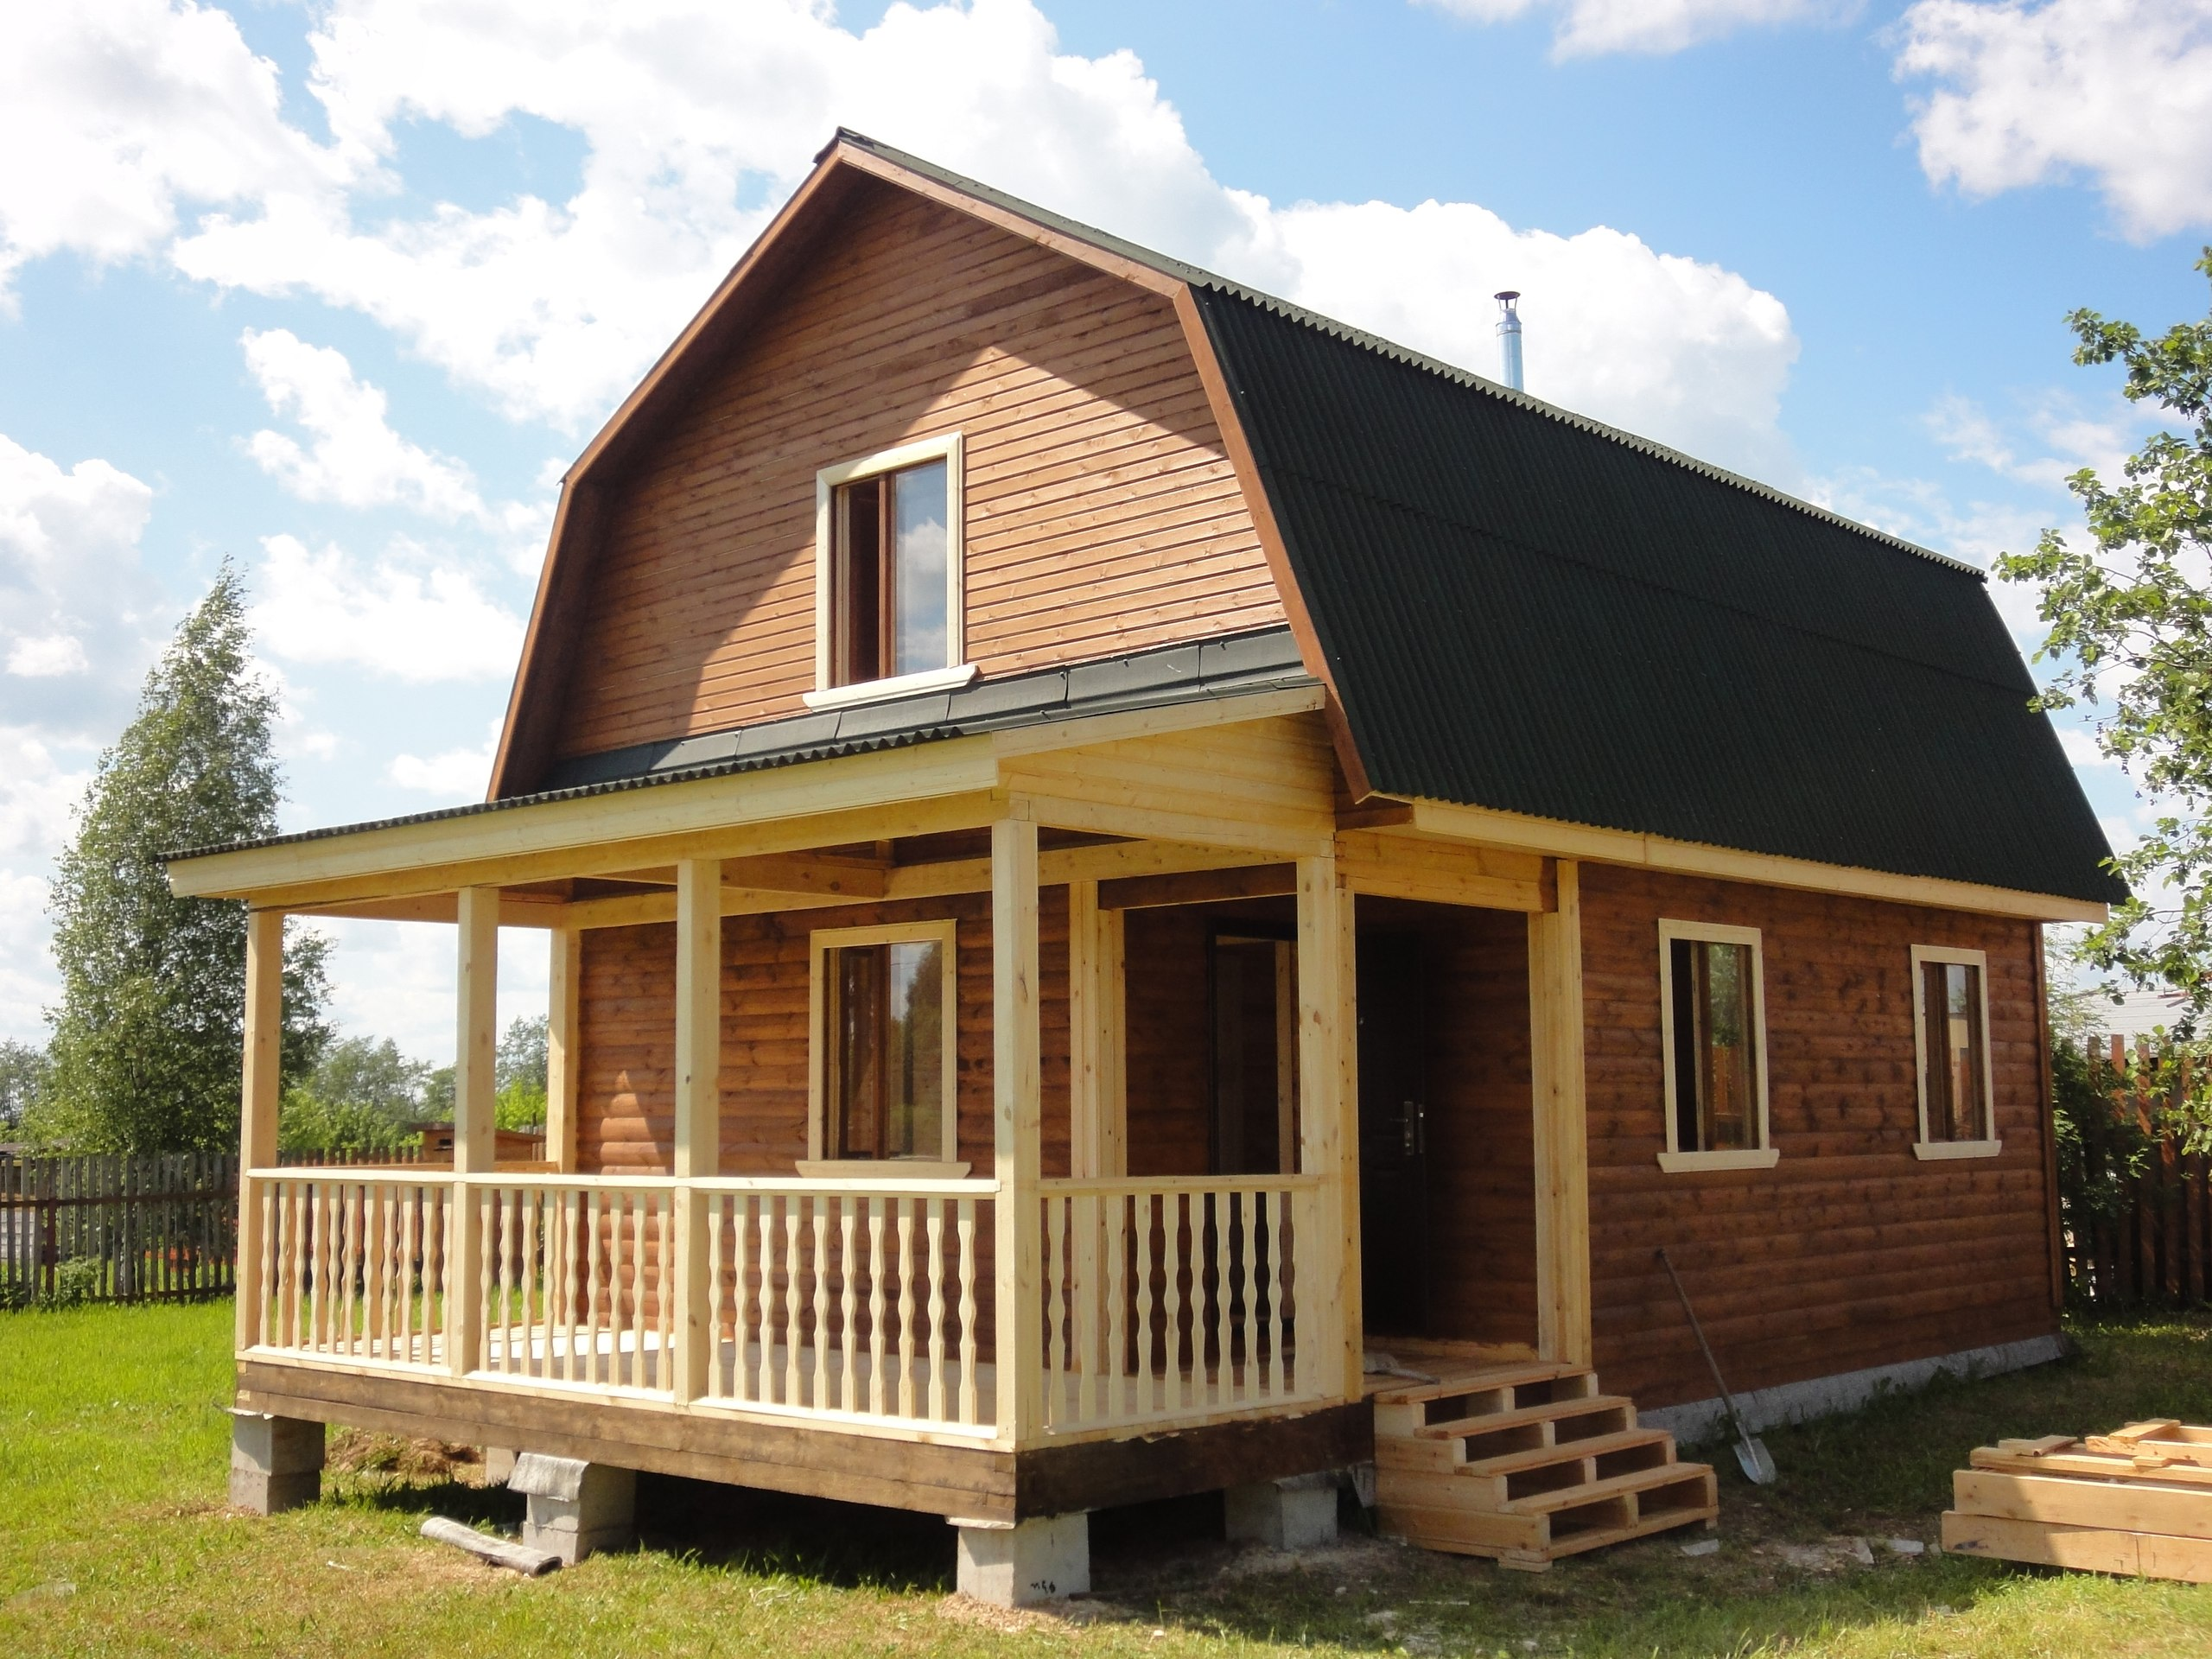 Картинки по запросу Дома и постройки из бруса: Преимущества материала